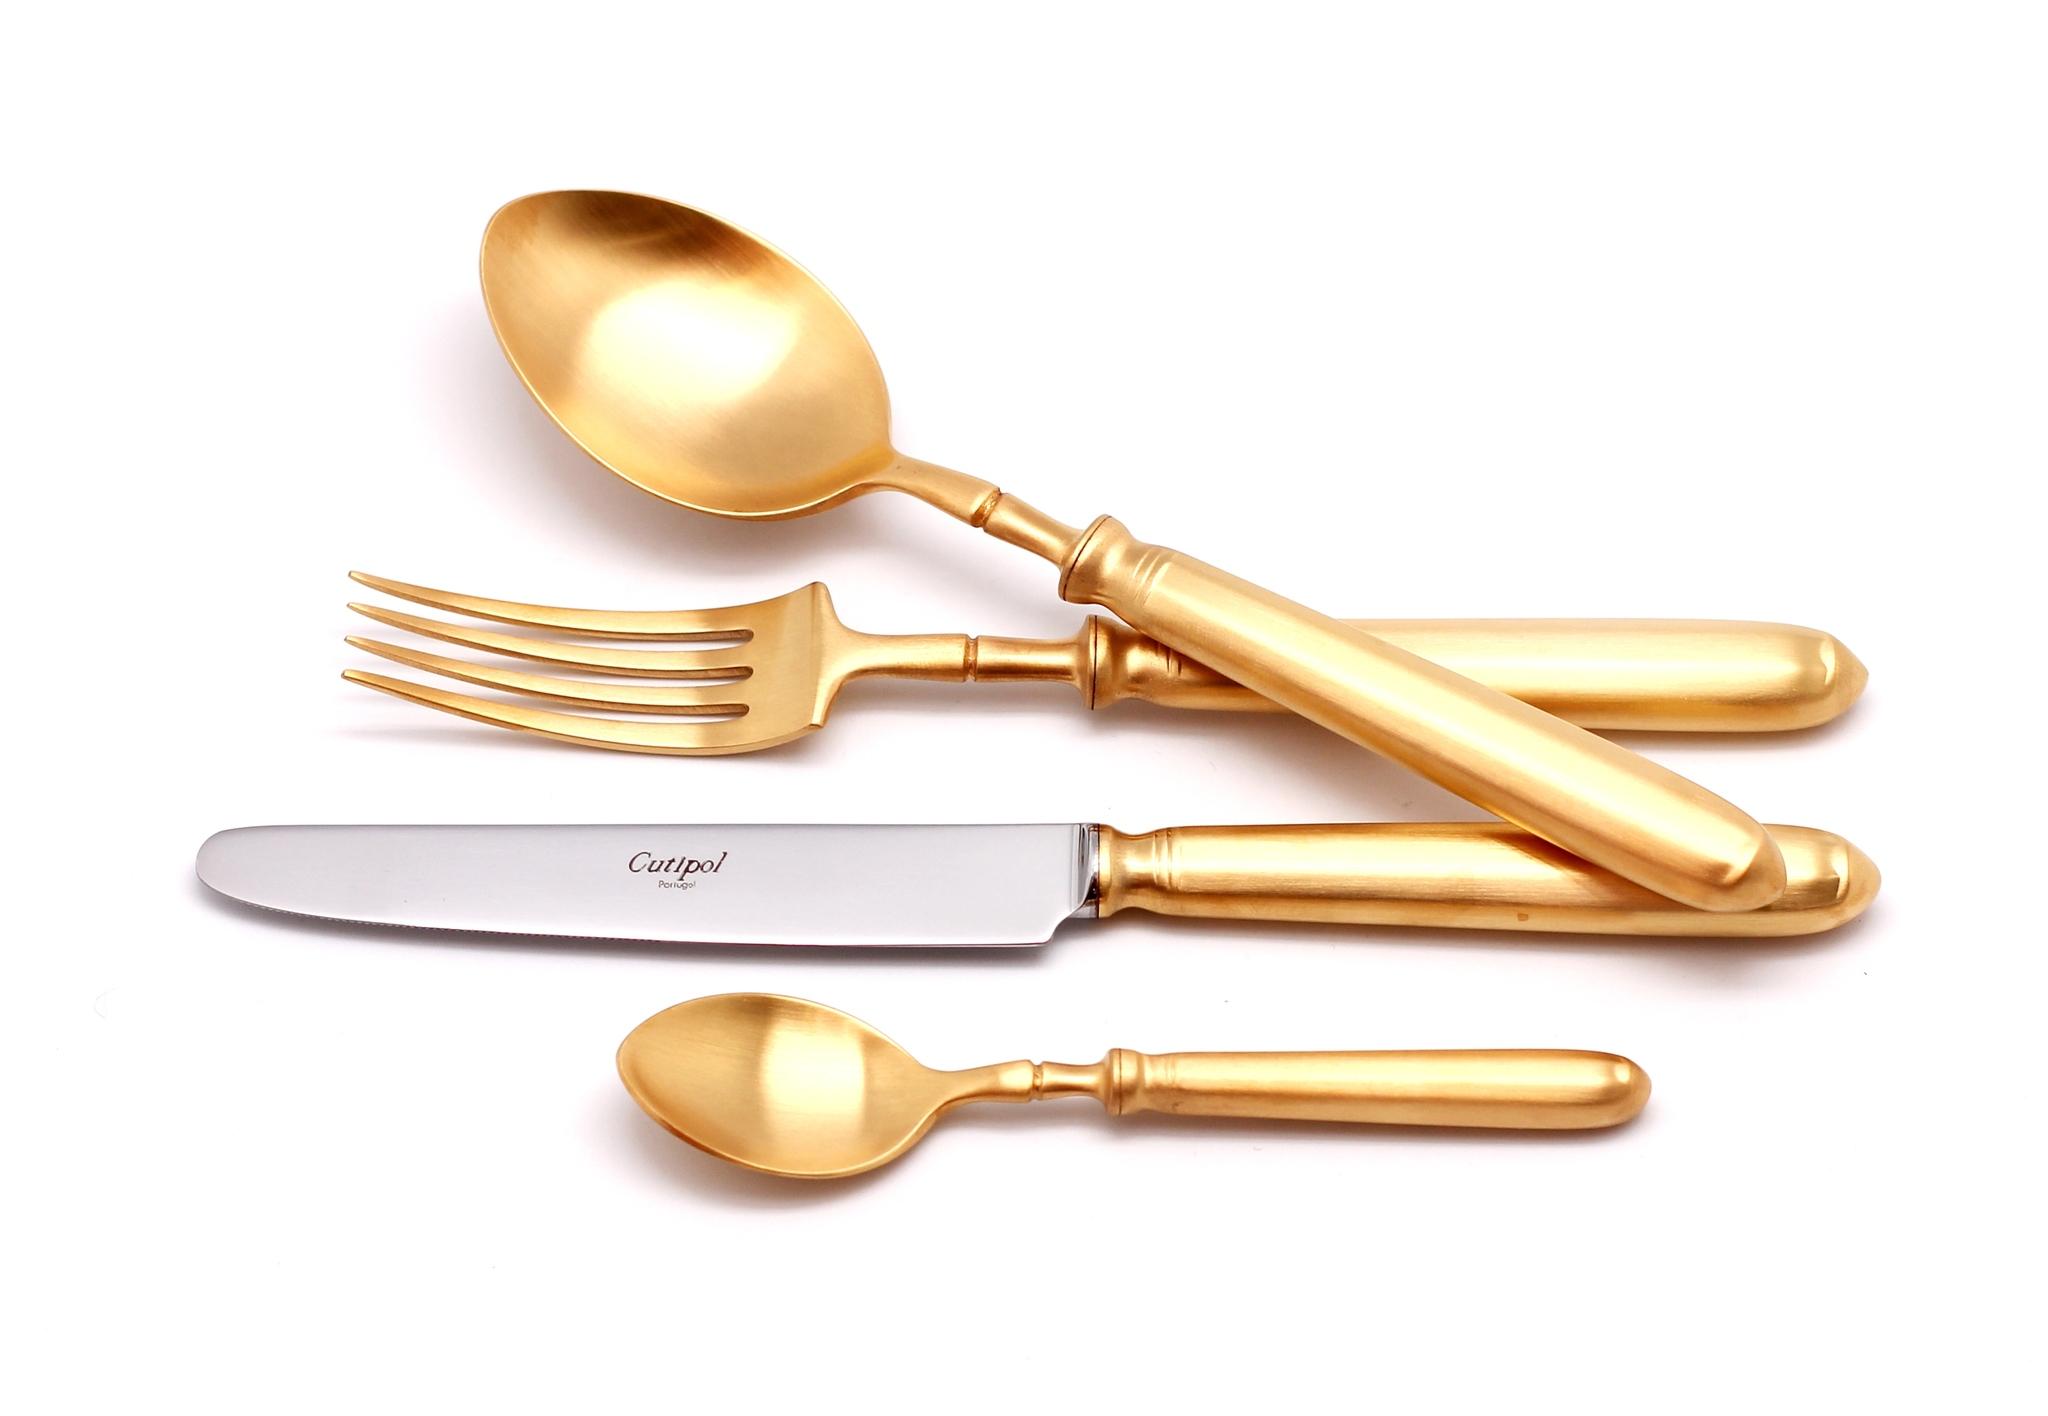 Набор 72 пр MITHOS GOLD, артикул 9152-72, производитель - Cutipol